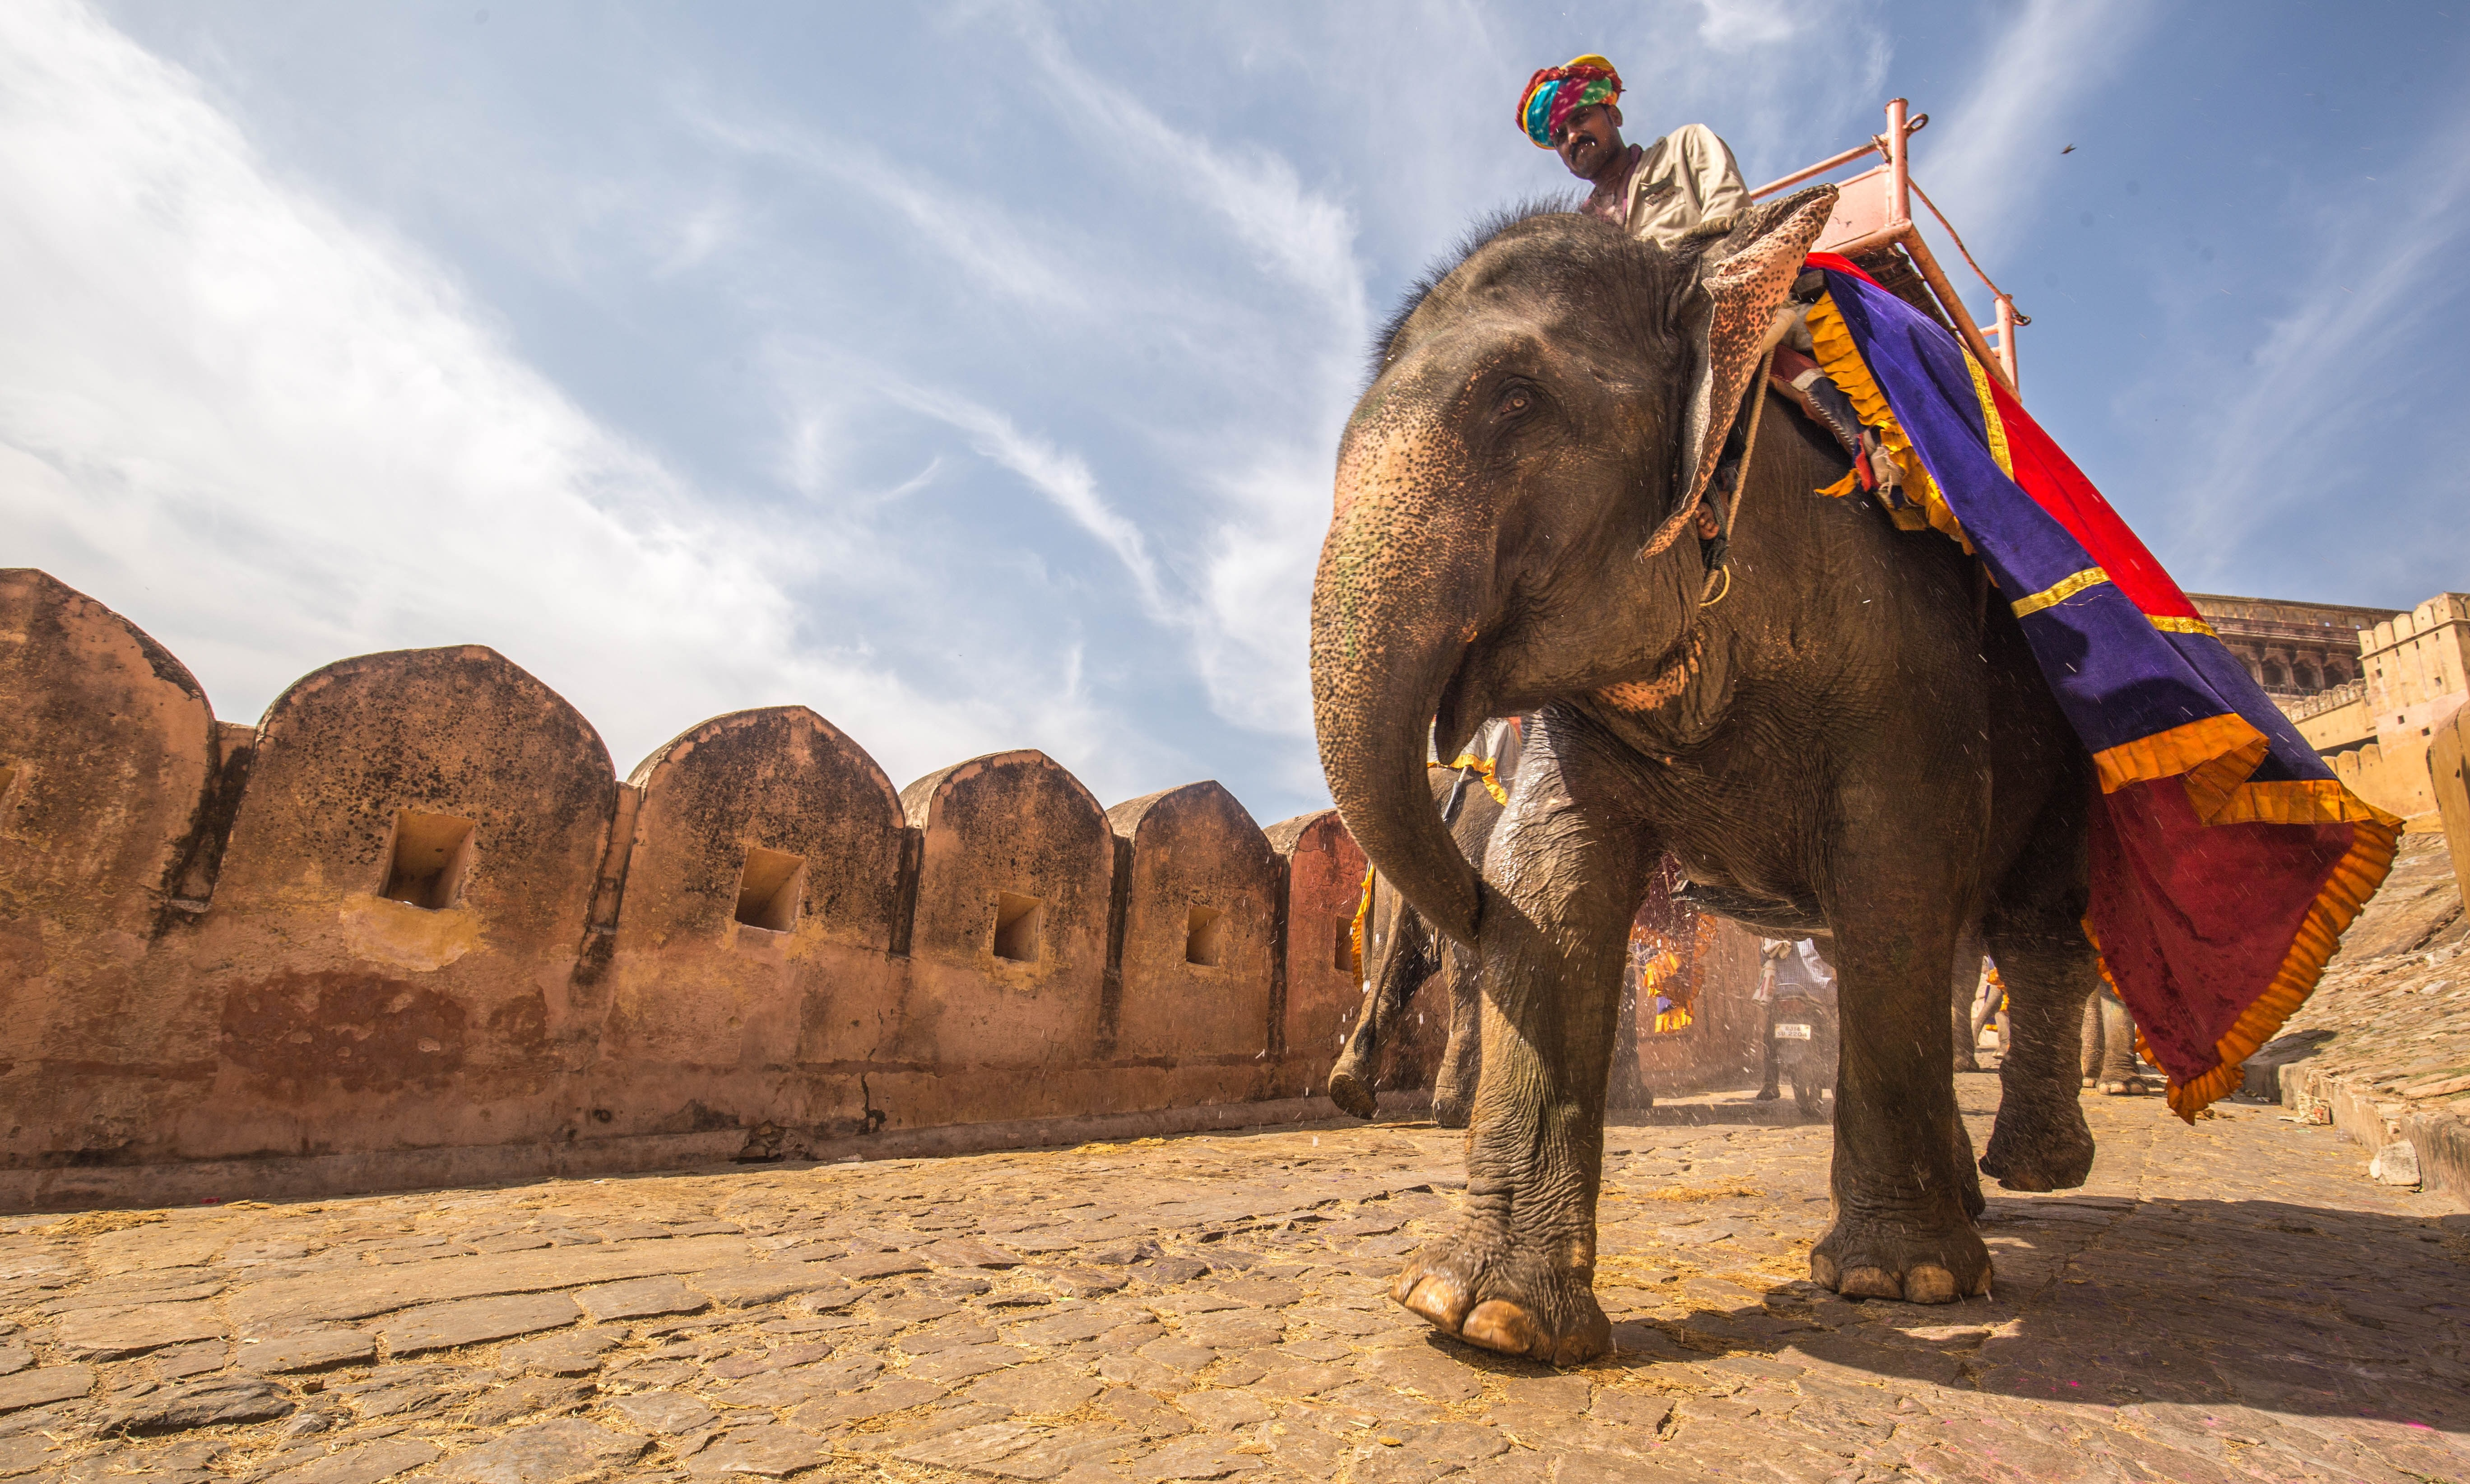 Riding an elephant in Jaipur, India